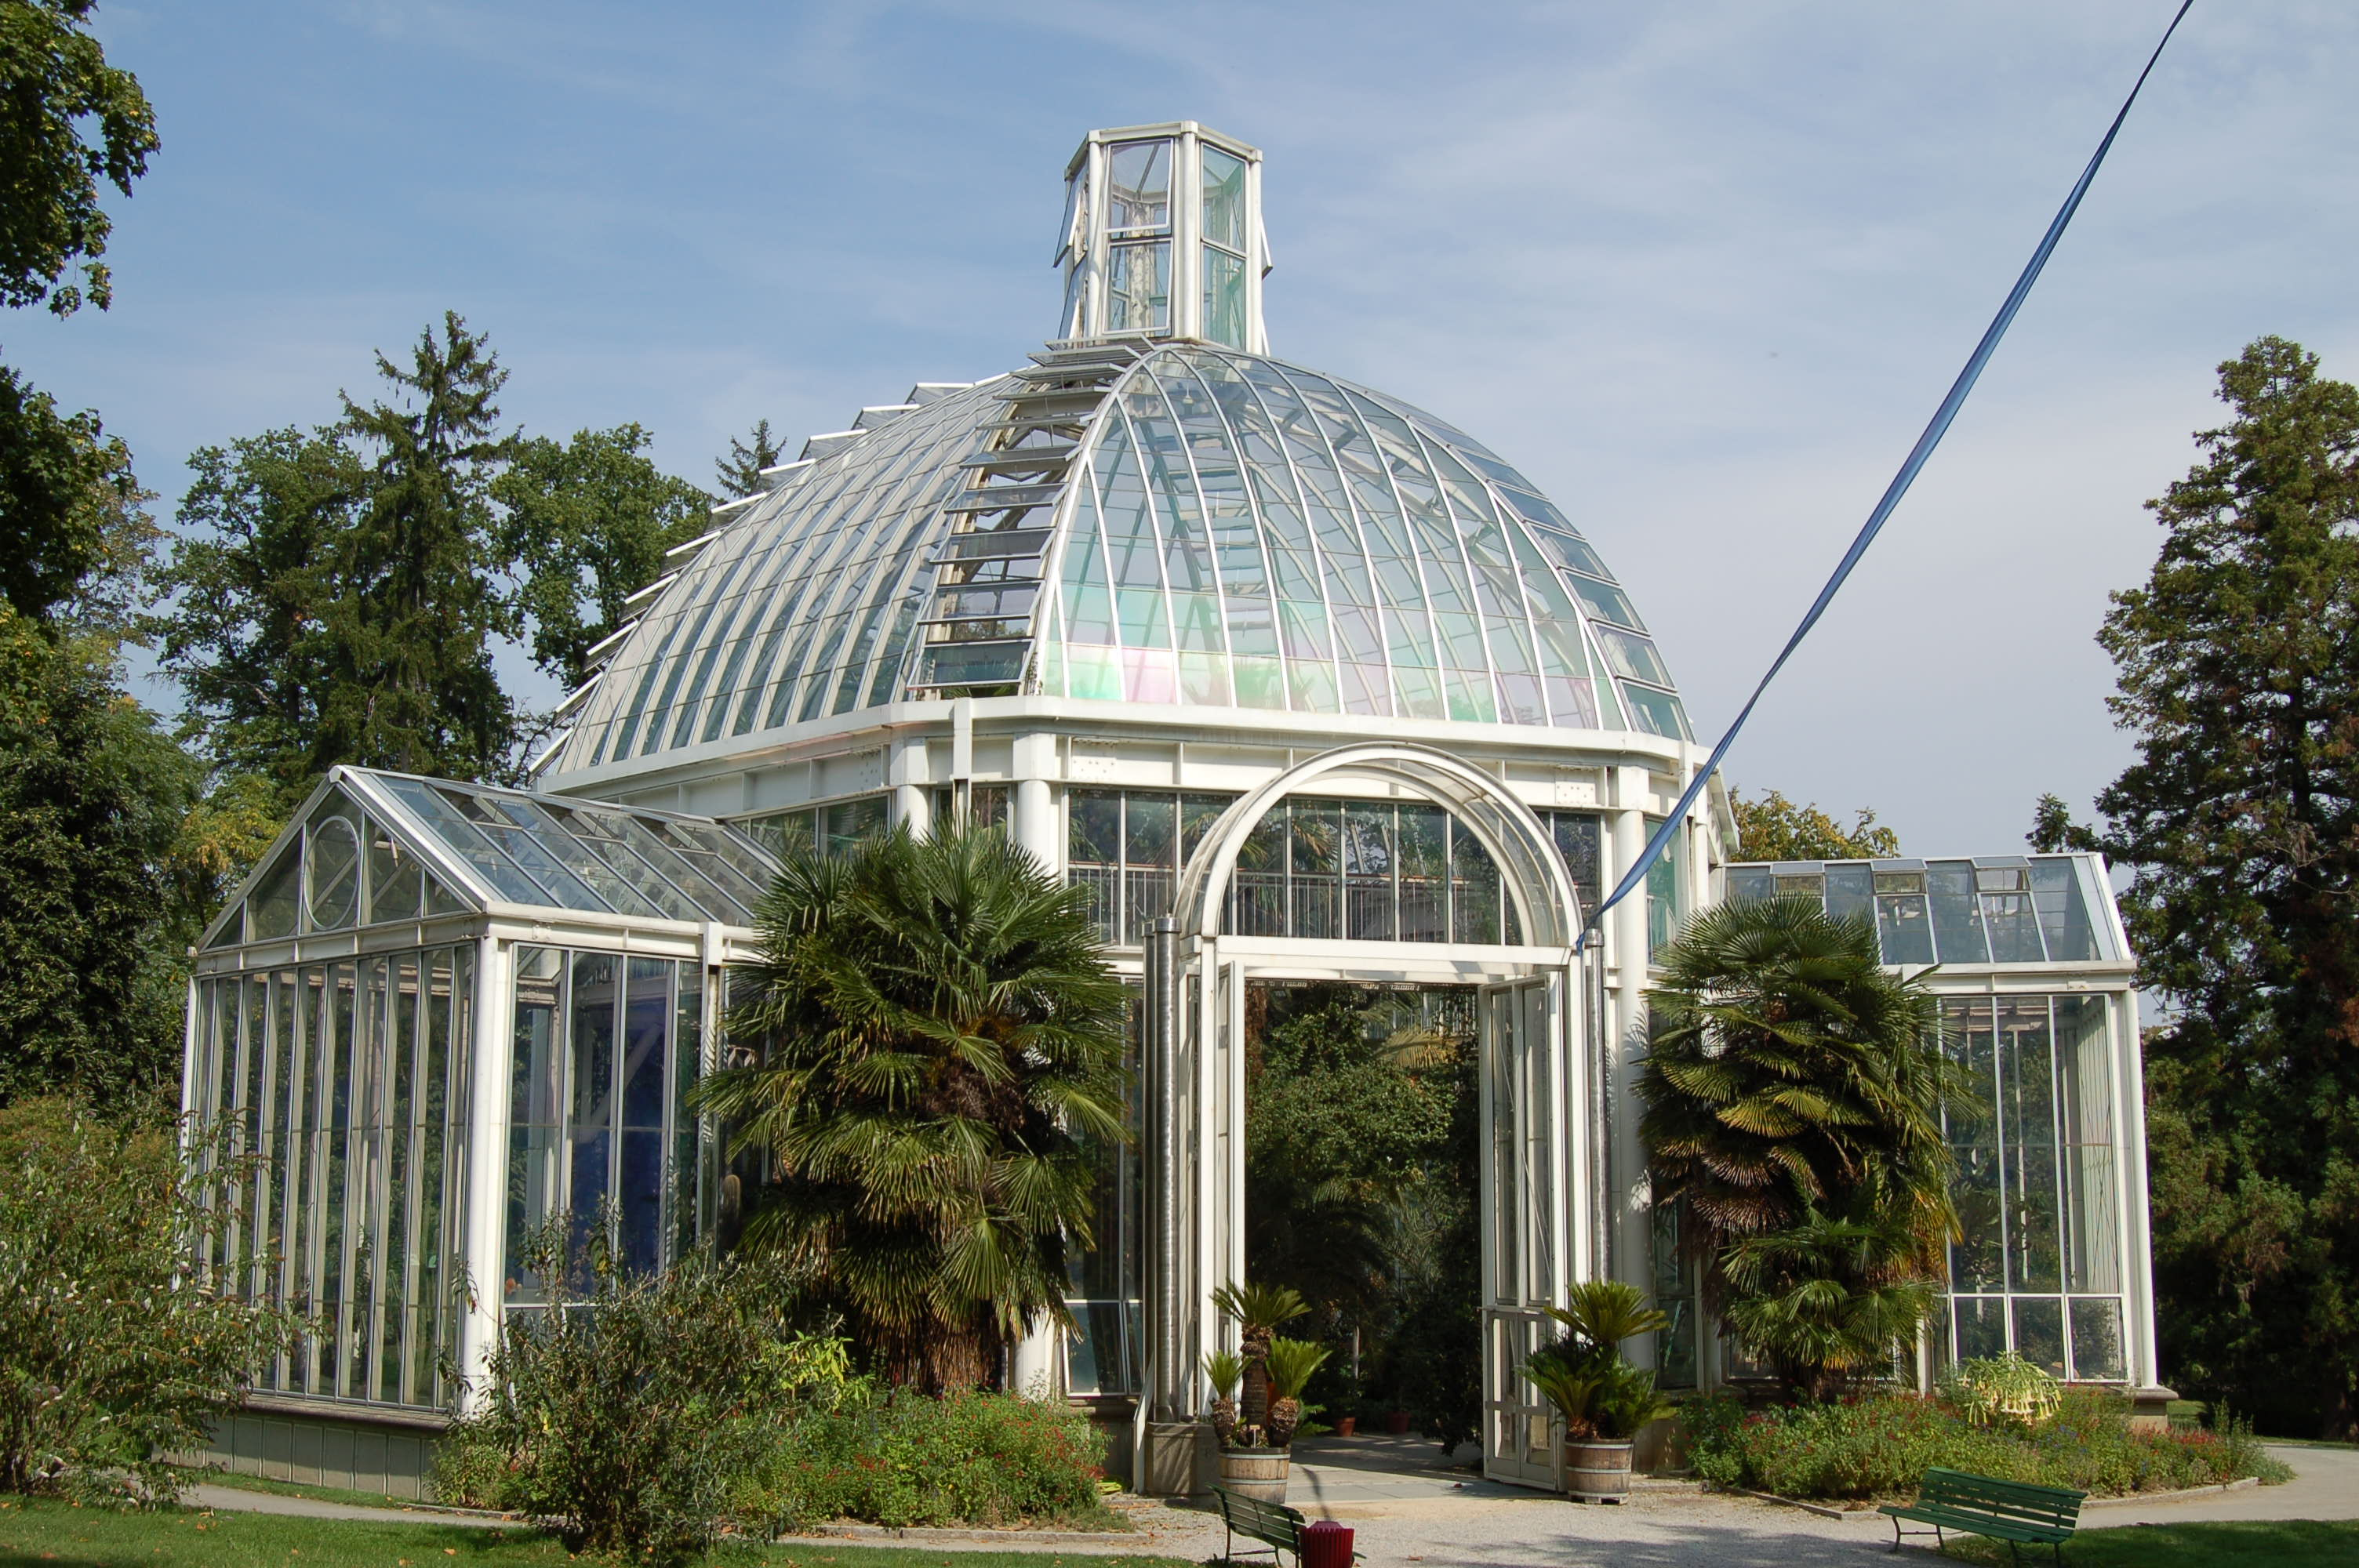 file botanical garden geneva 2006 804 jpg wikimedia commons. Black Bedroom Furniture Sets. Home Design Ideas